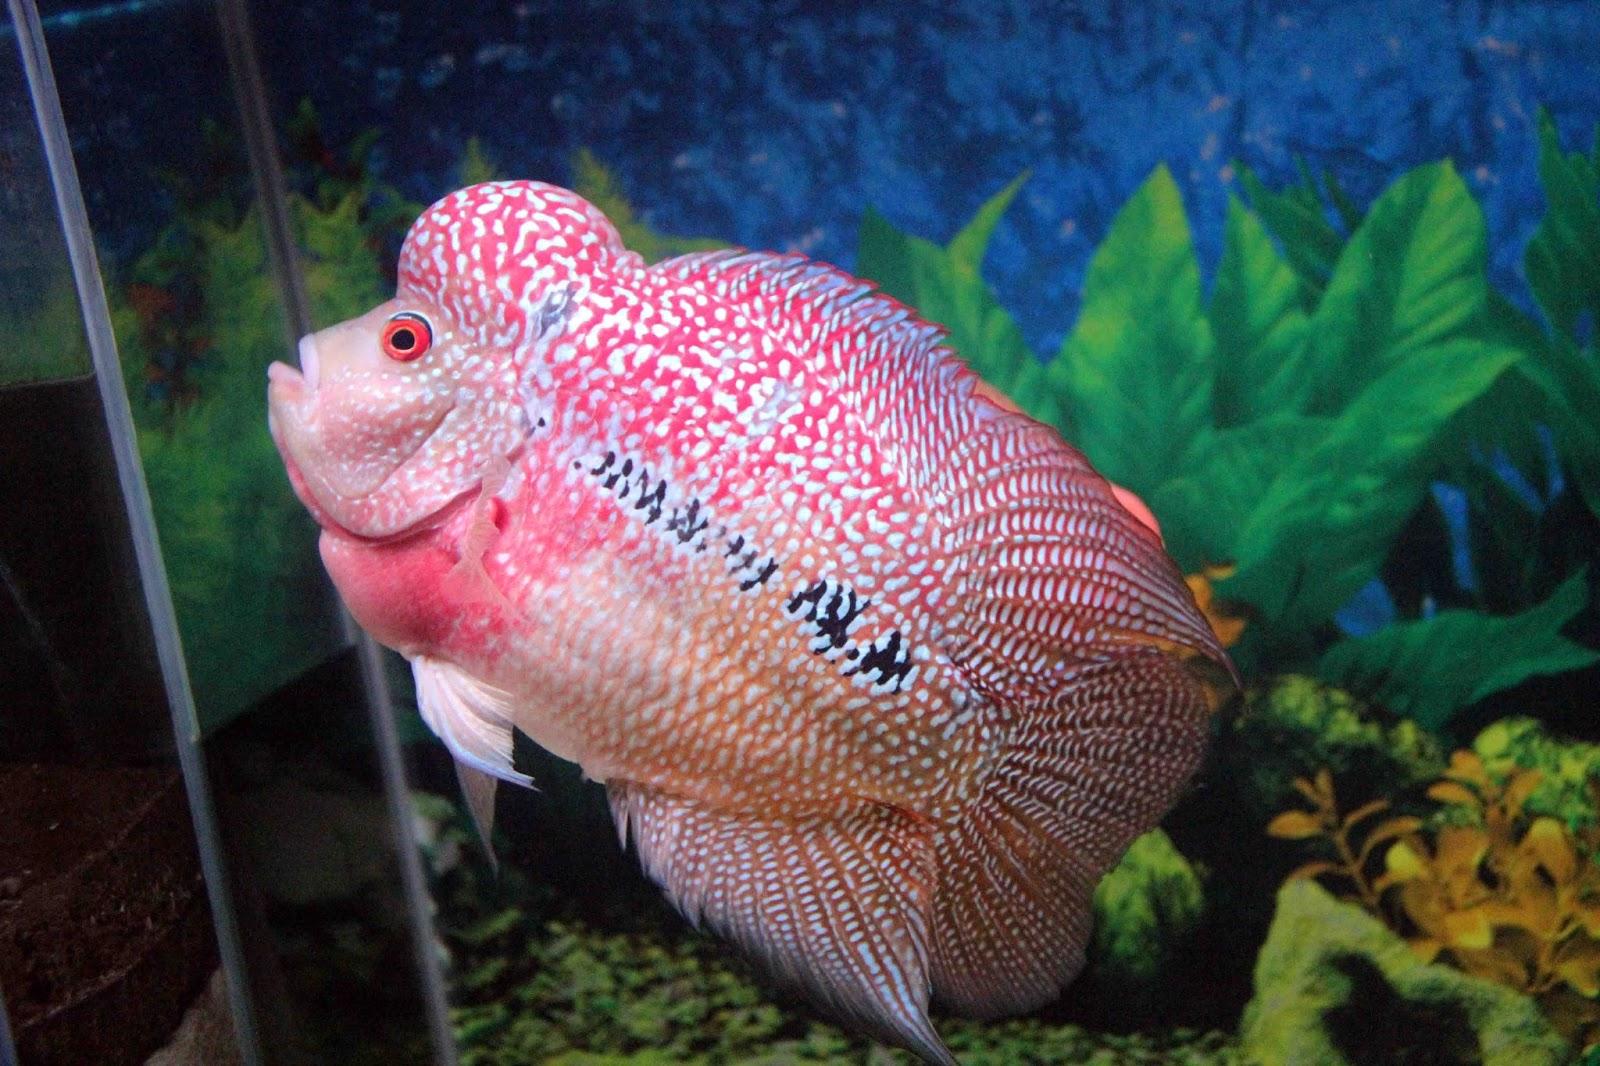 gambar ikan - gambar ikan air tawar